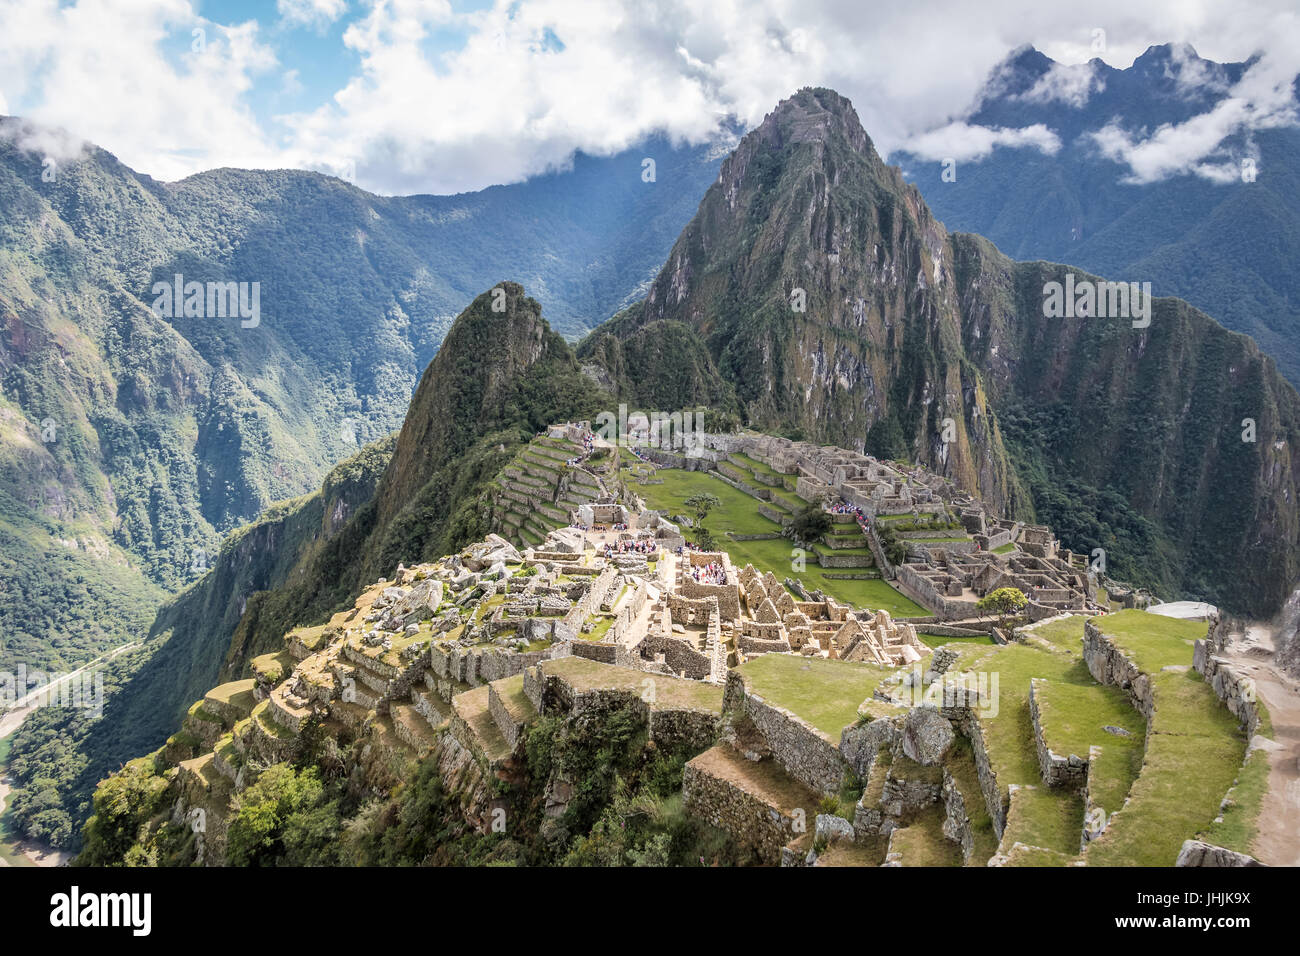 Inkaruinen Machu Picchu - Heiliges Tal, Peru Stockbild